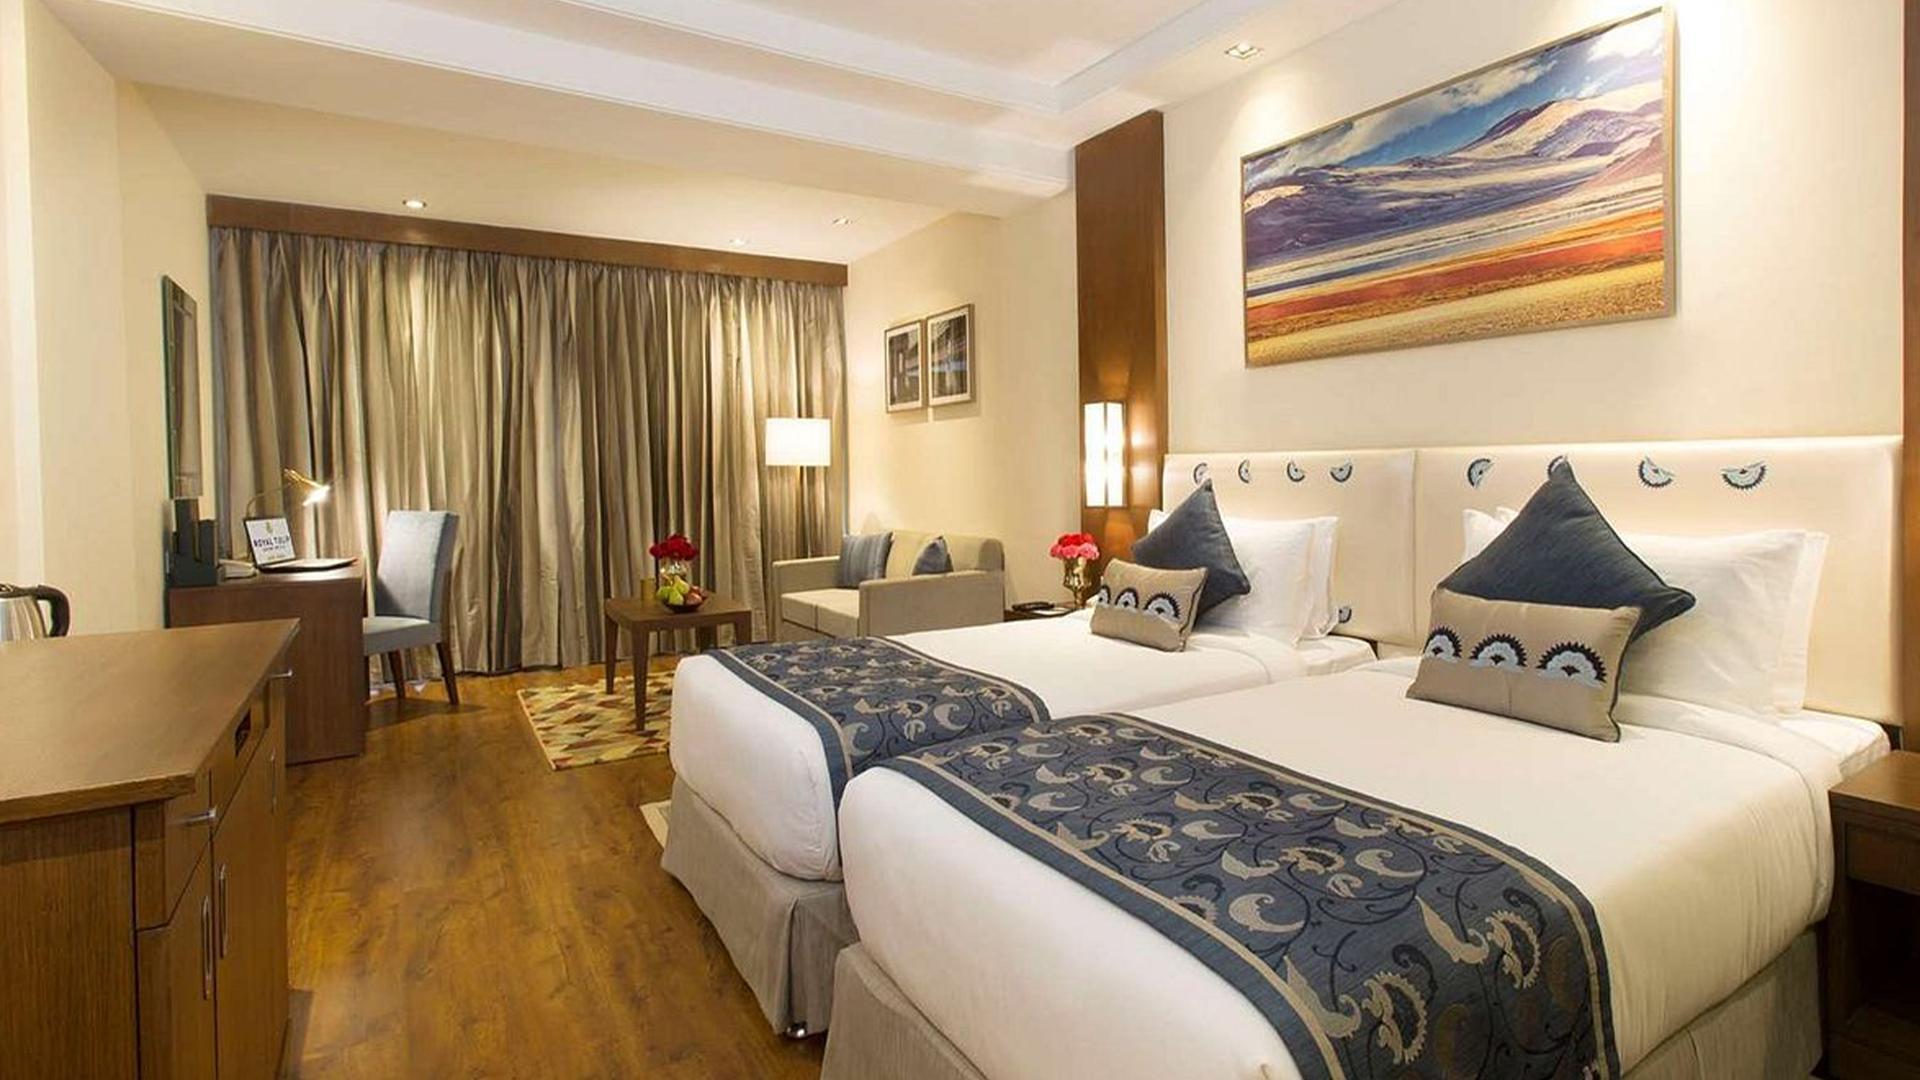 Premium Room image 1 at Royal Tulip Shimla, Kufri Hills by Shimla, Himachal Pradesh, India